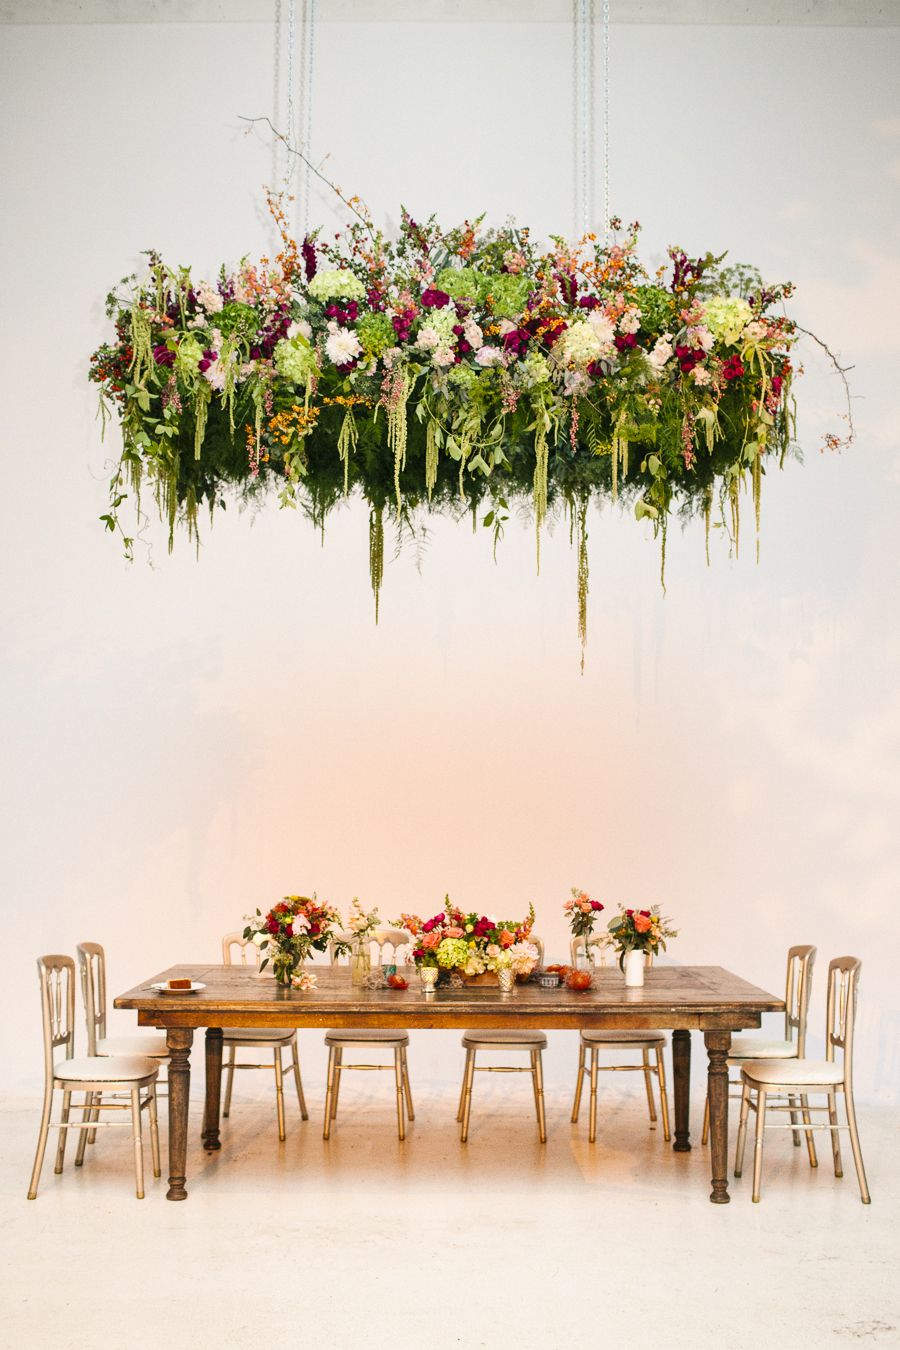 Garden loft wedding with an amazing floral instalation flower garden loft wedding with an amazing floral instalation aloadofball Image collections